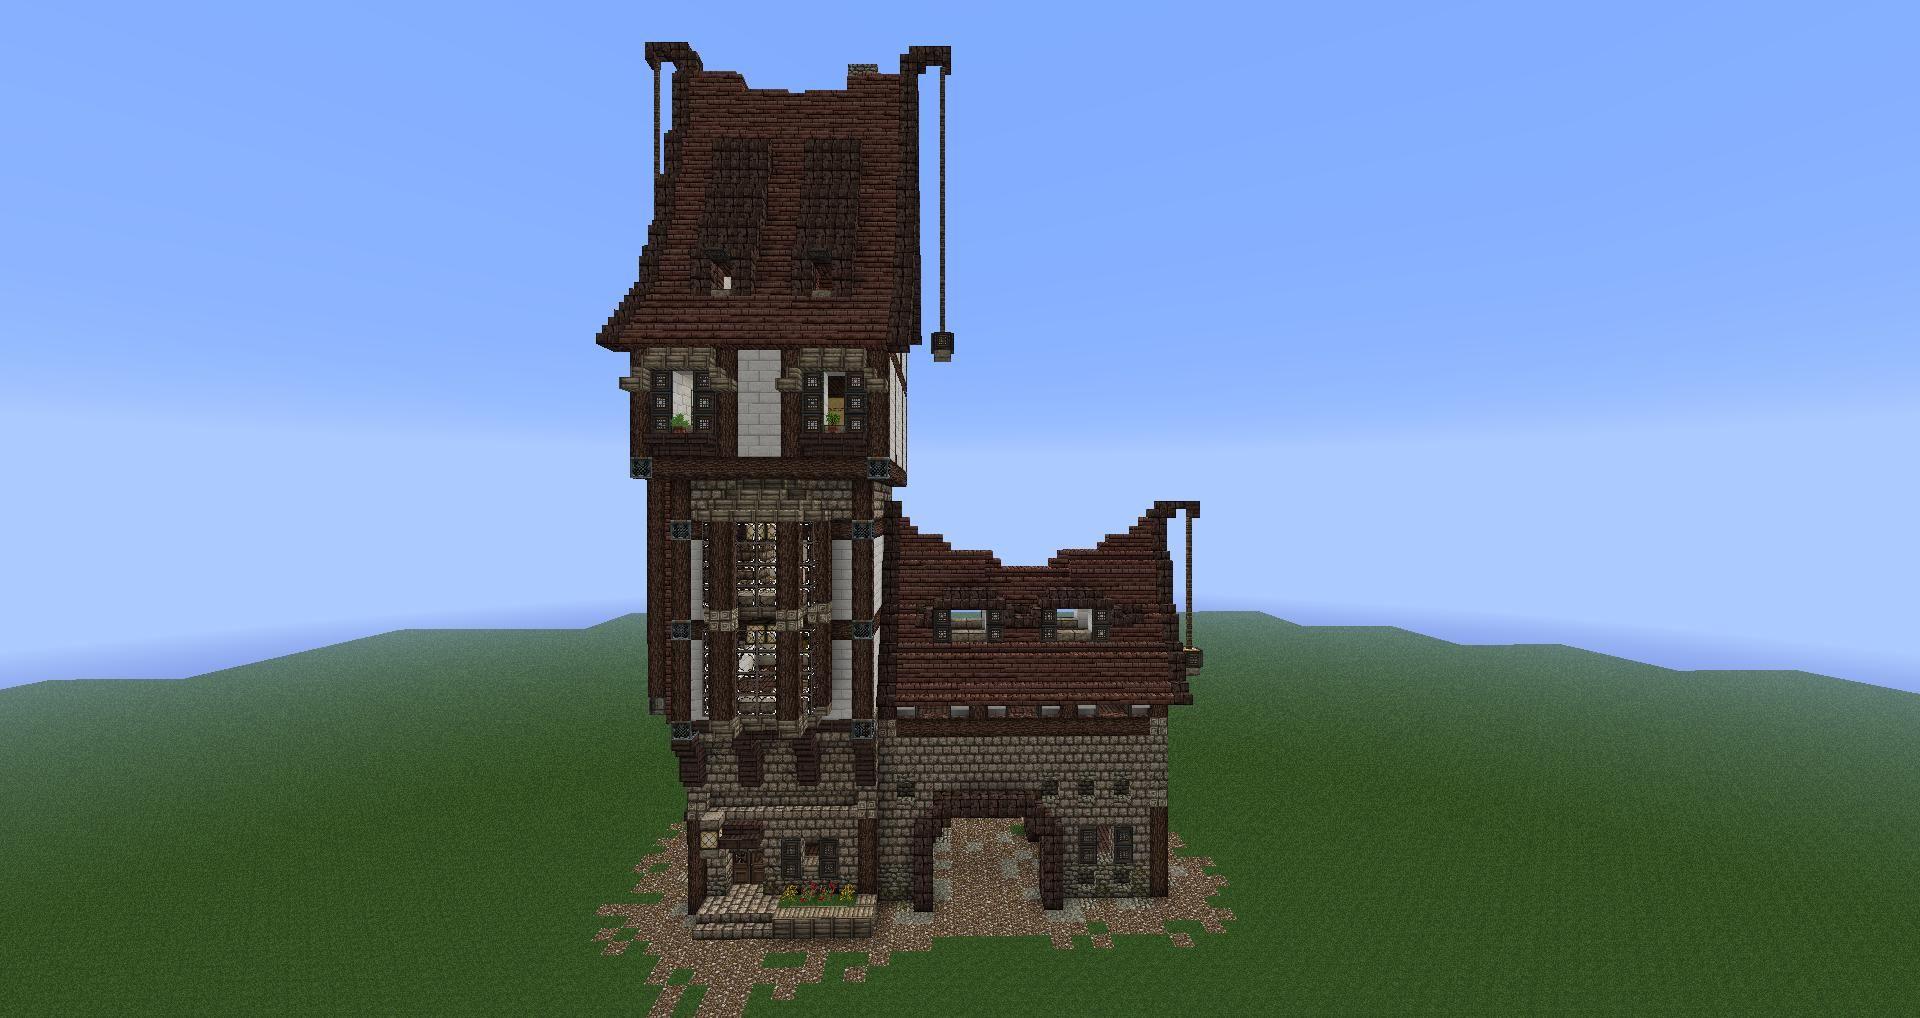 Trulph U0026 39 S Fantasy Builds - Screenshots - Show Your Creation - Minecraft Forum